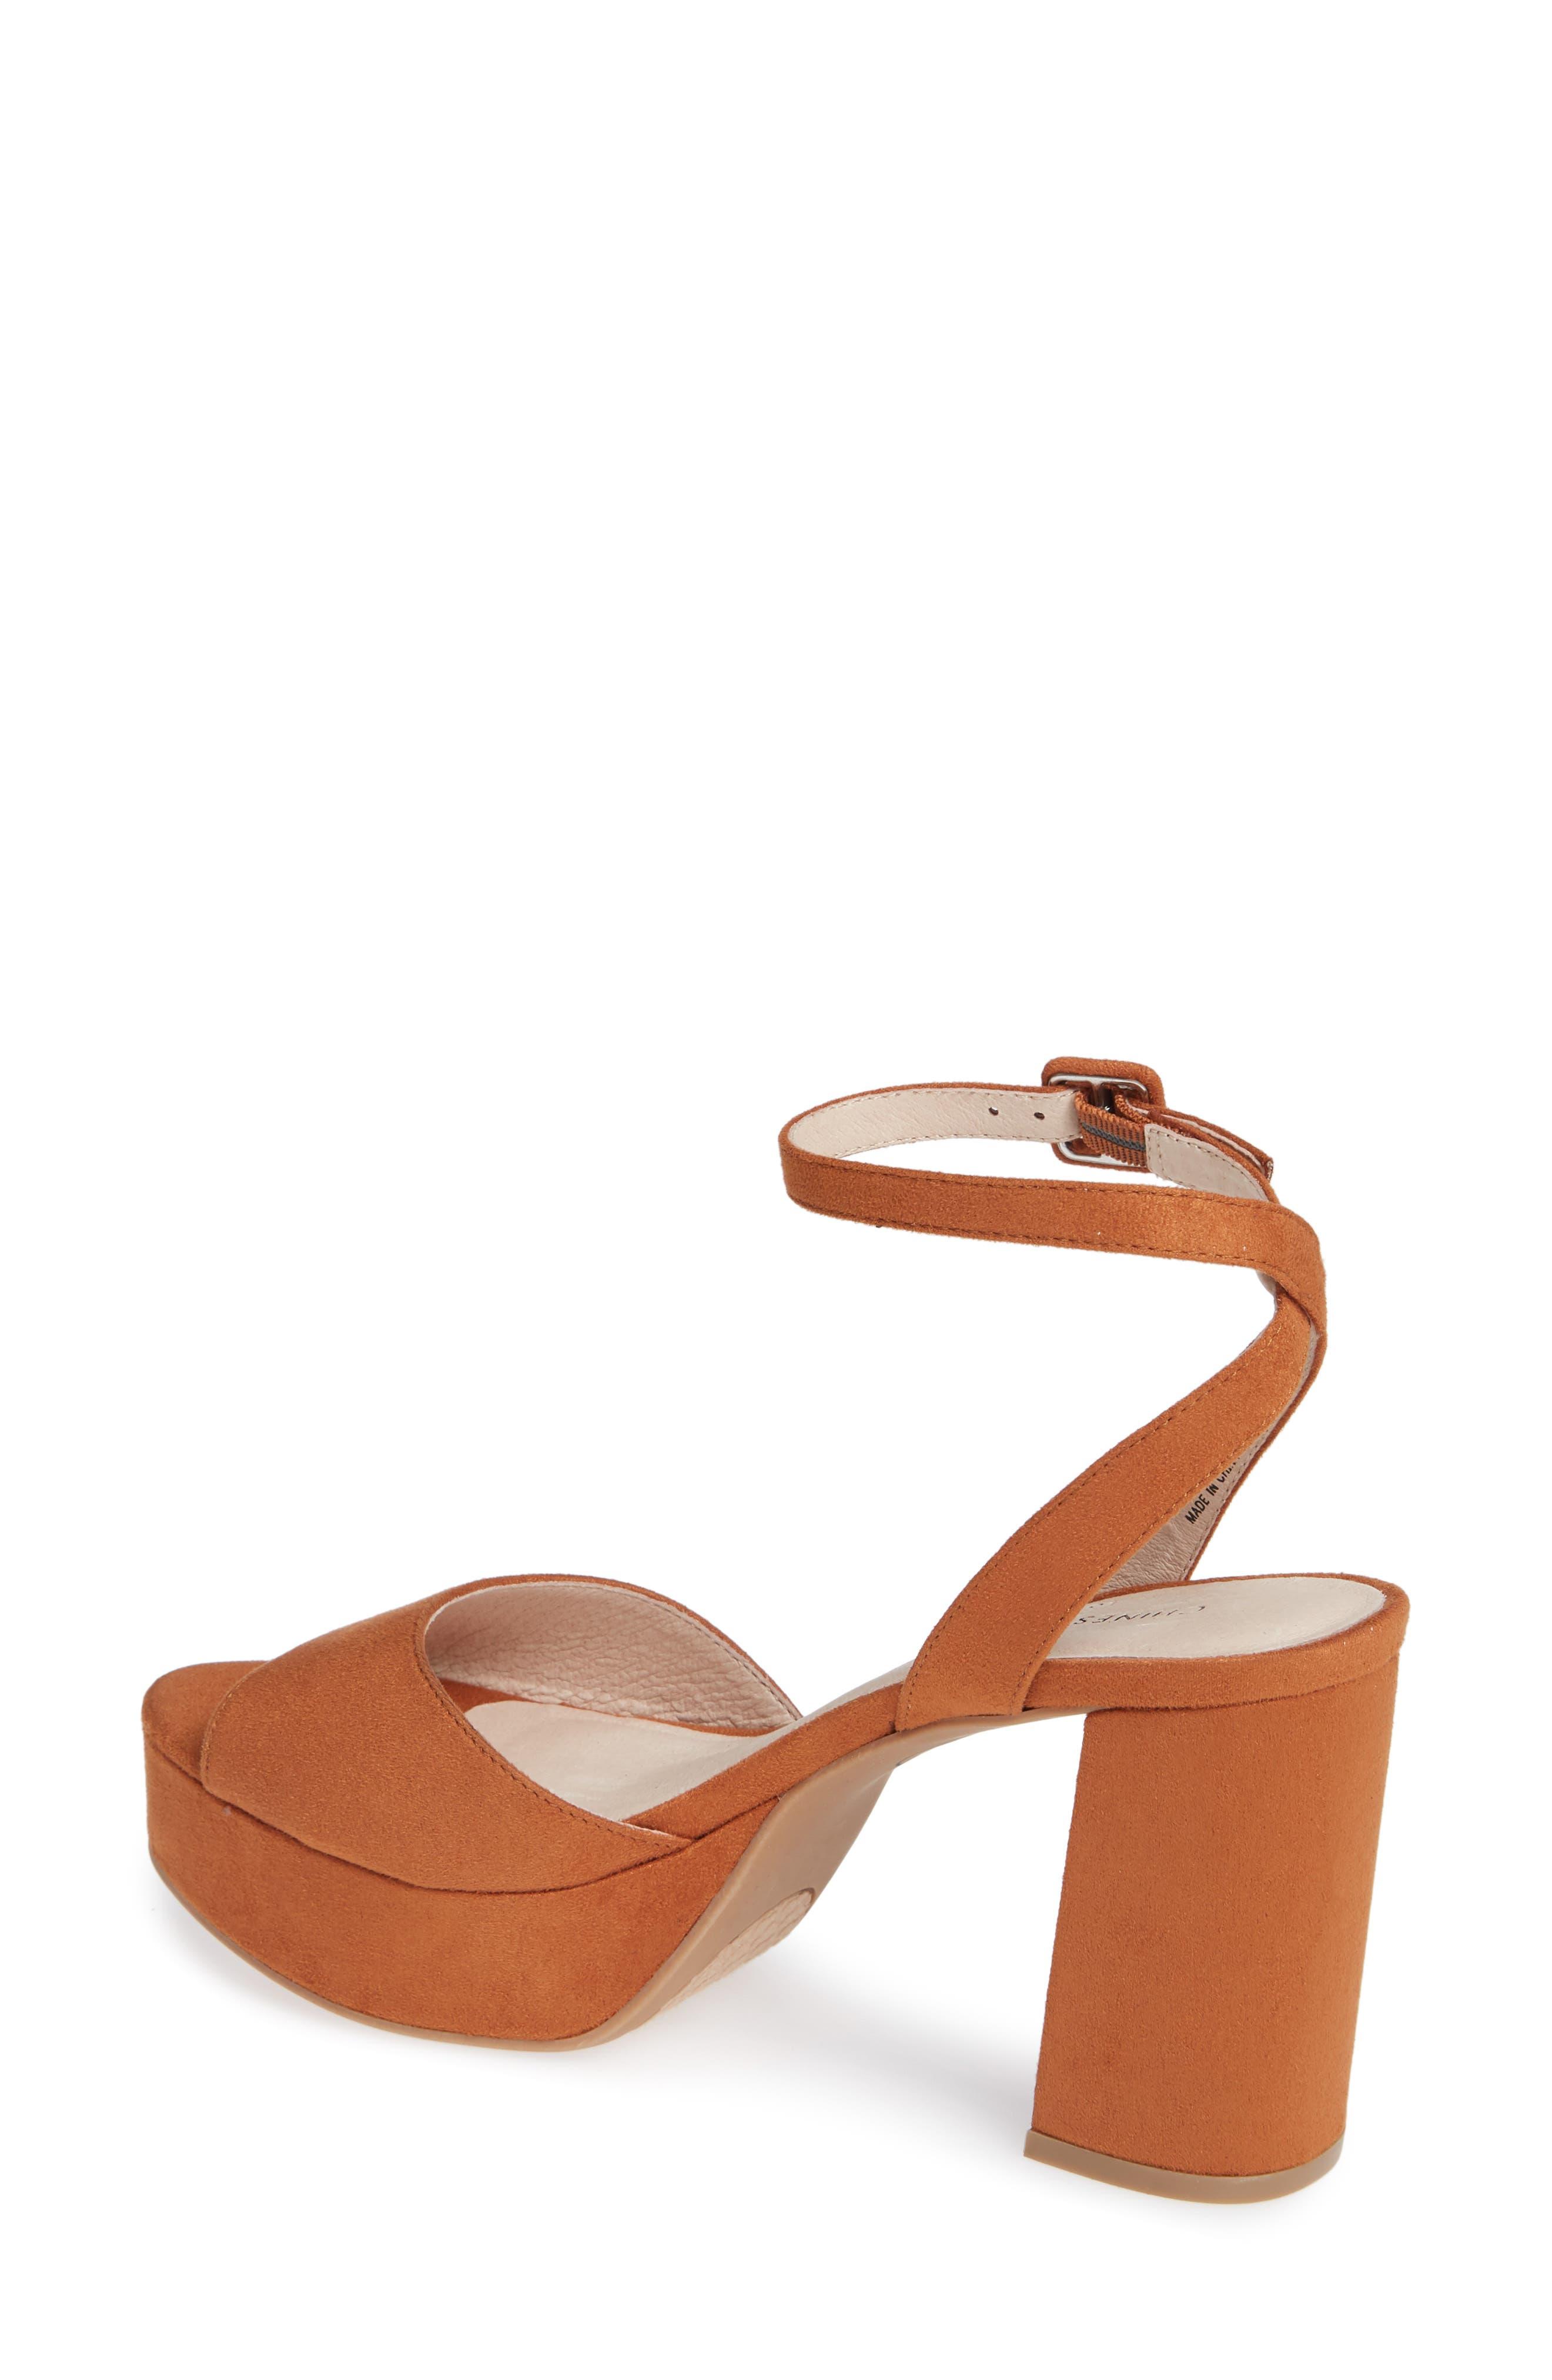 Theresa Platform Sandal,                             Alternate thumbnail 2, color,                             UMBER SUEDE